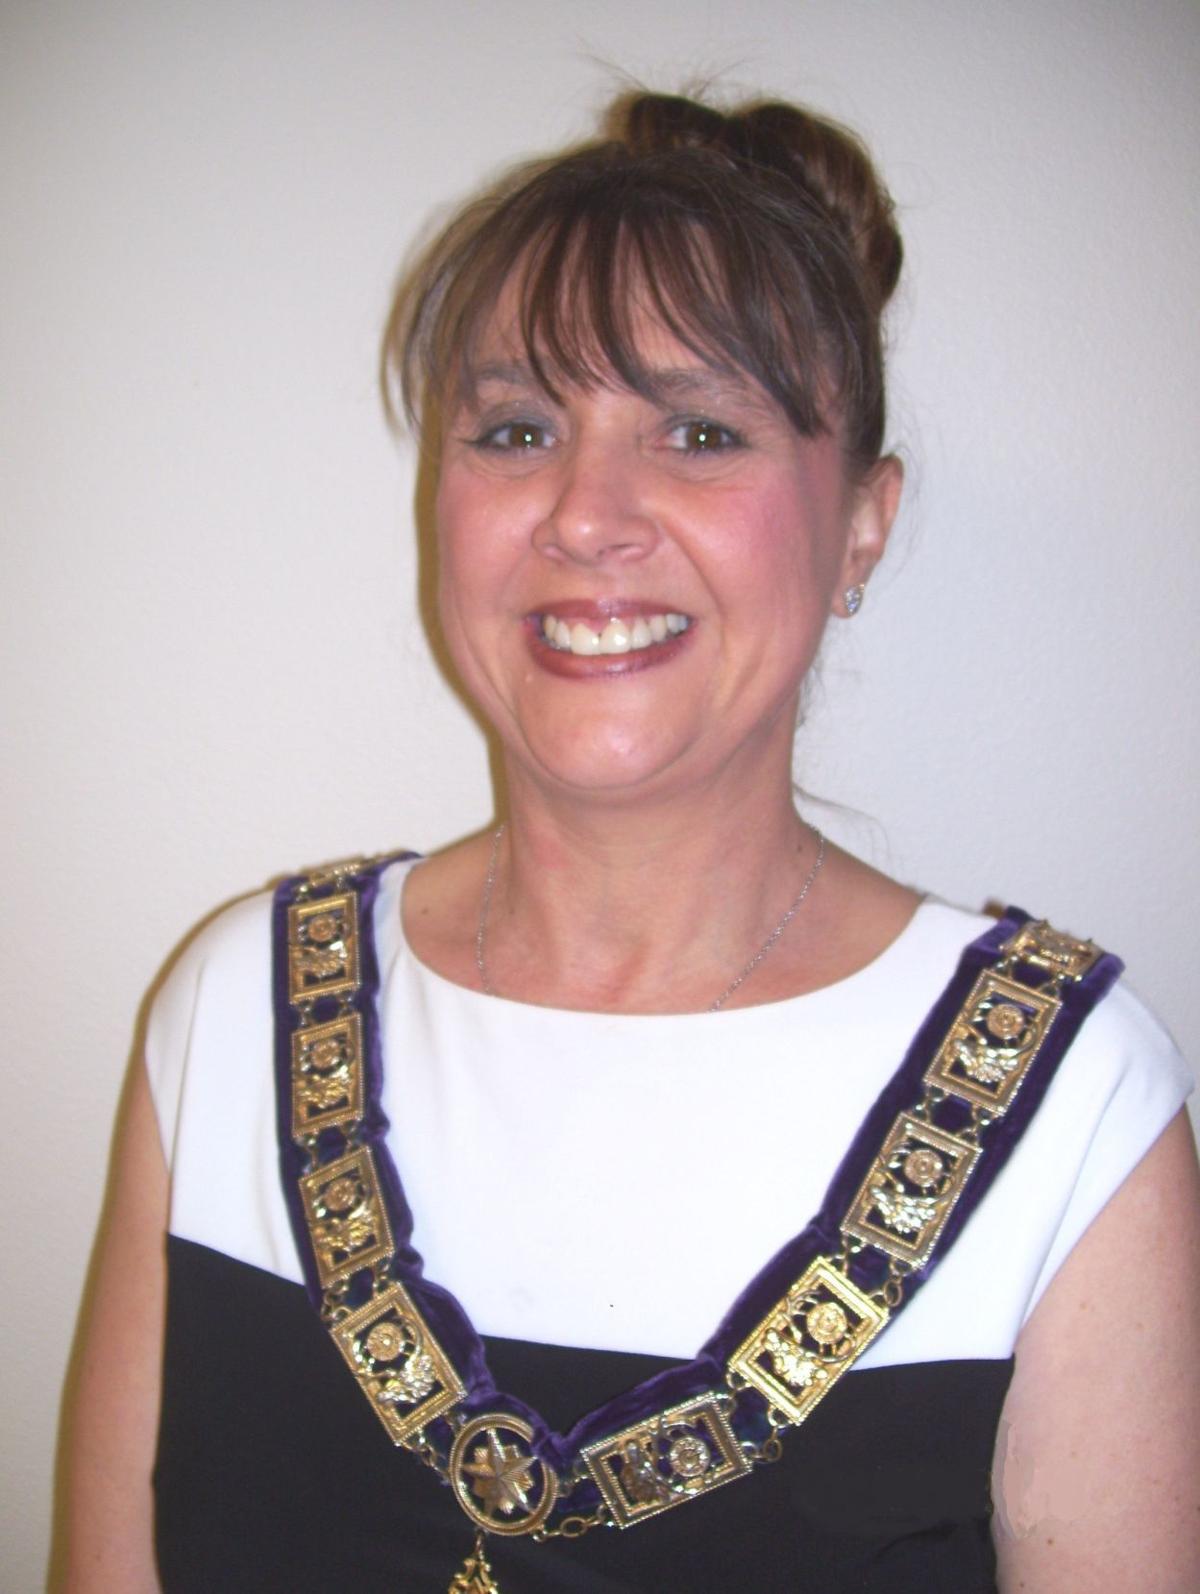 Shelley Steyh